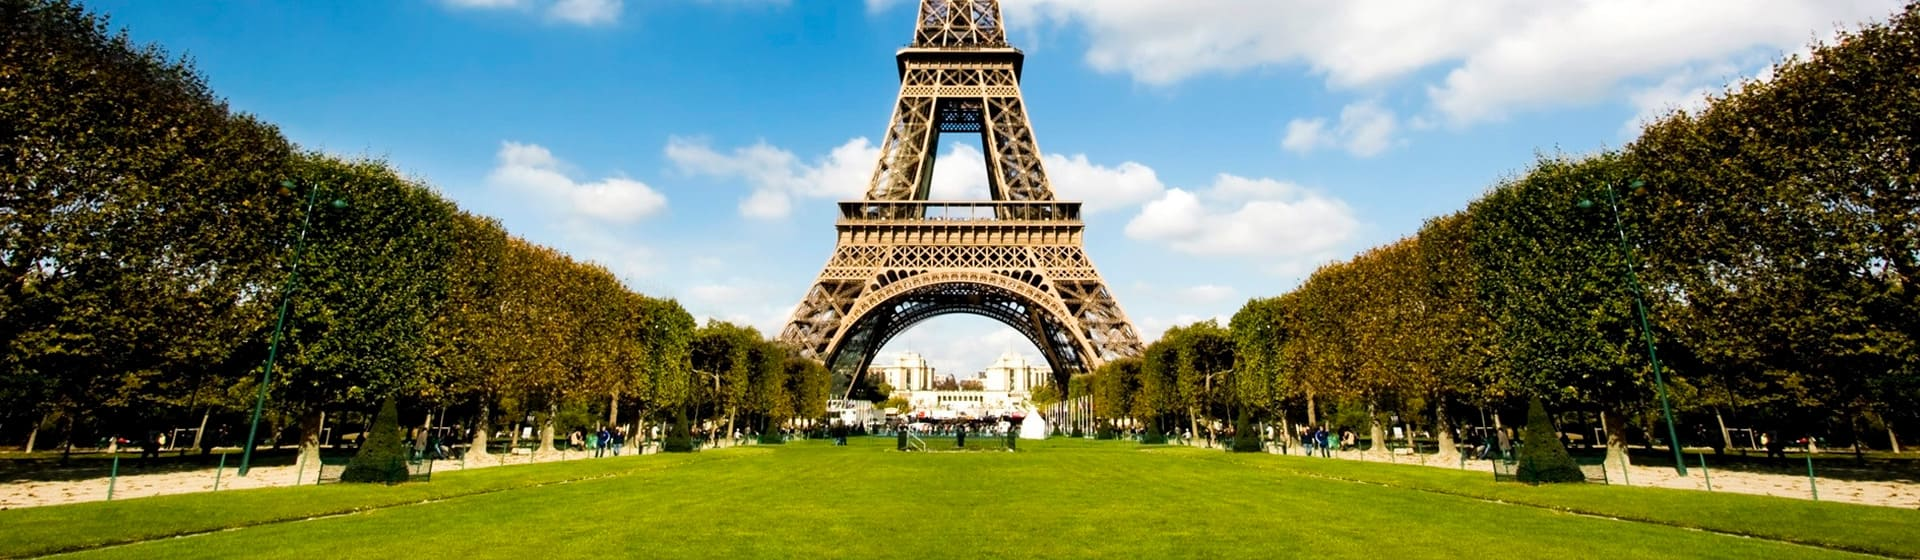 Франция - Мерч и одежда с атрибутикой